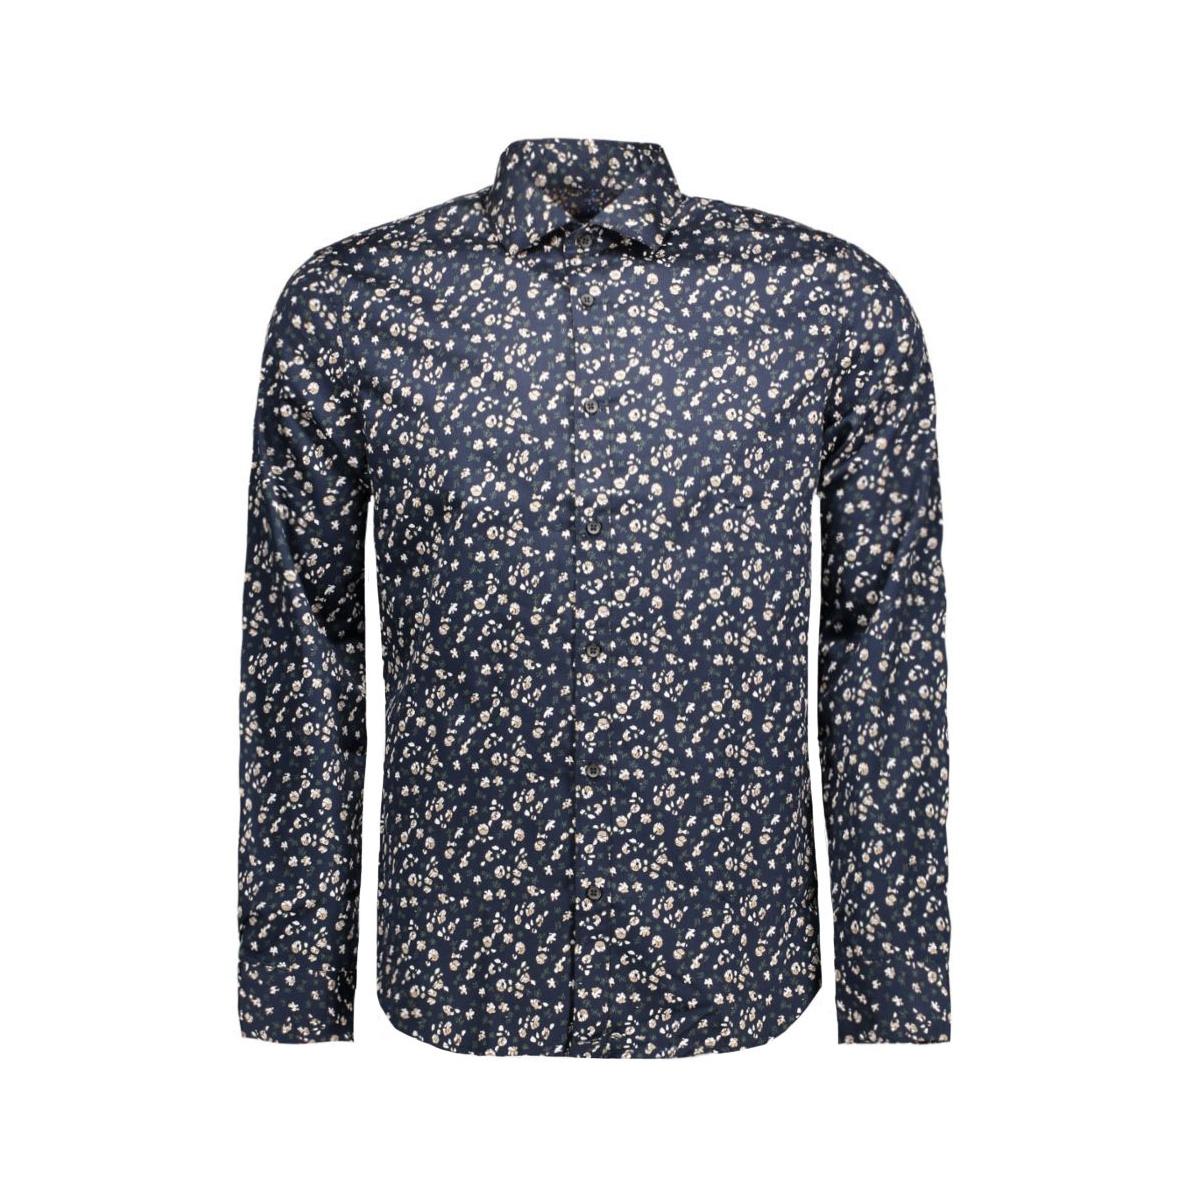 trostol 30201175 matinique overhemd 20211 navy blazer